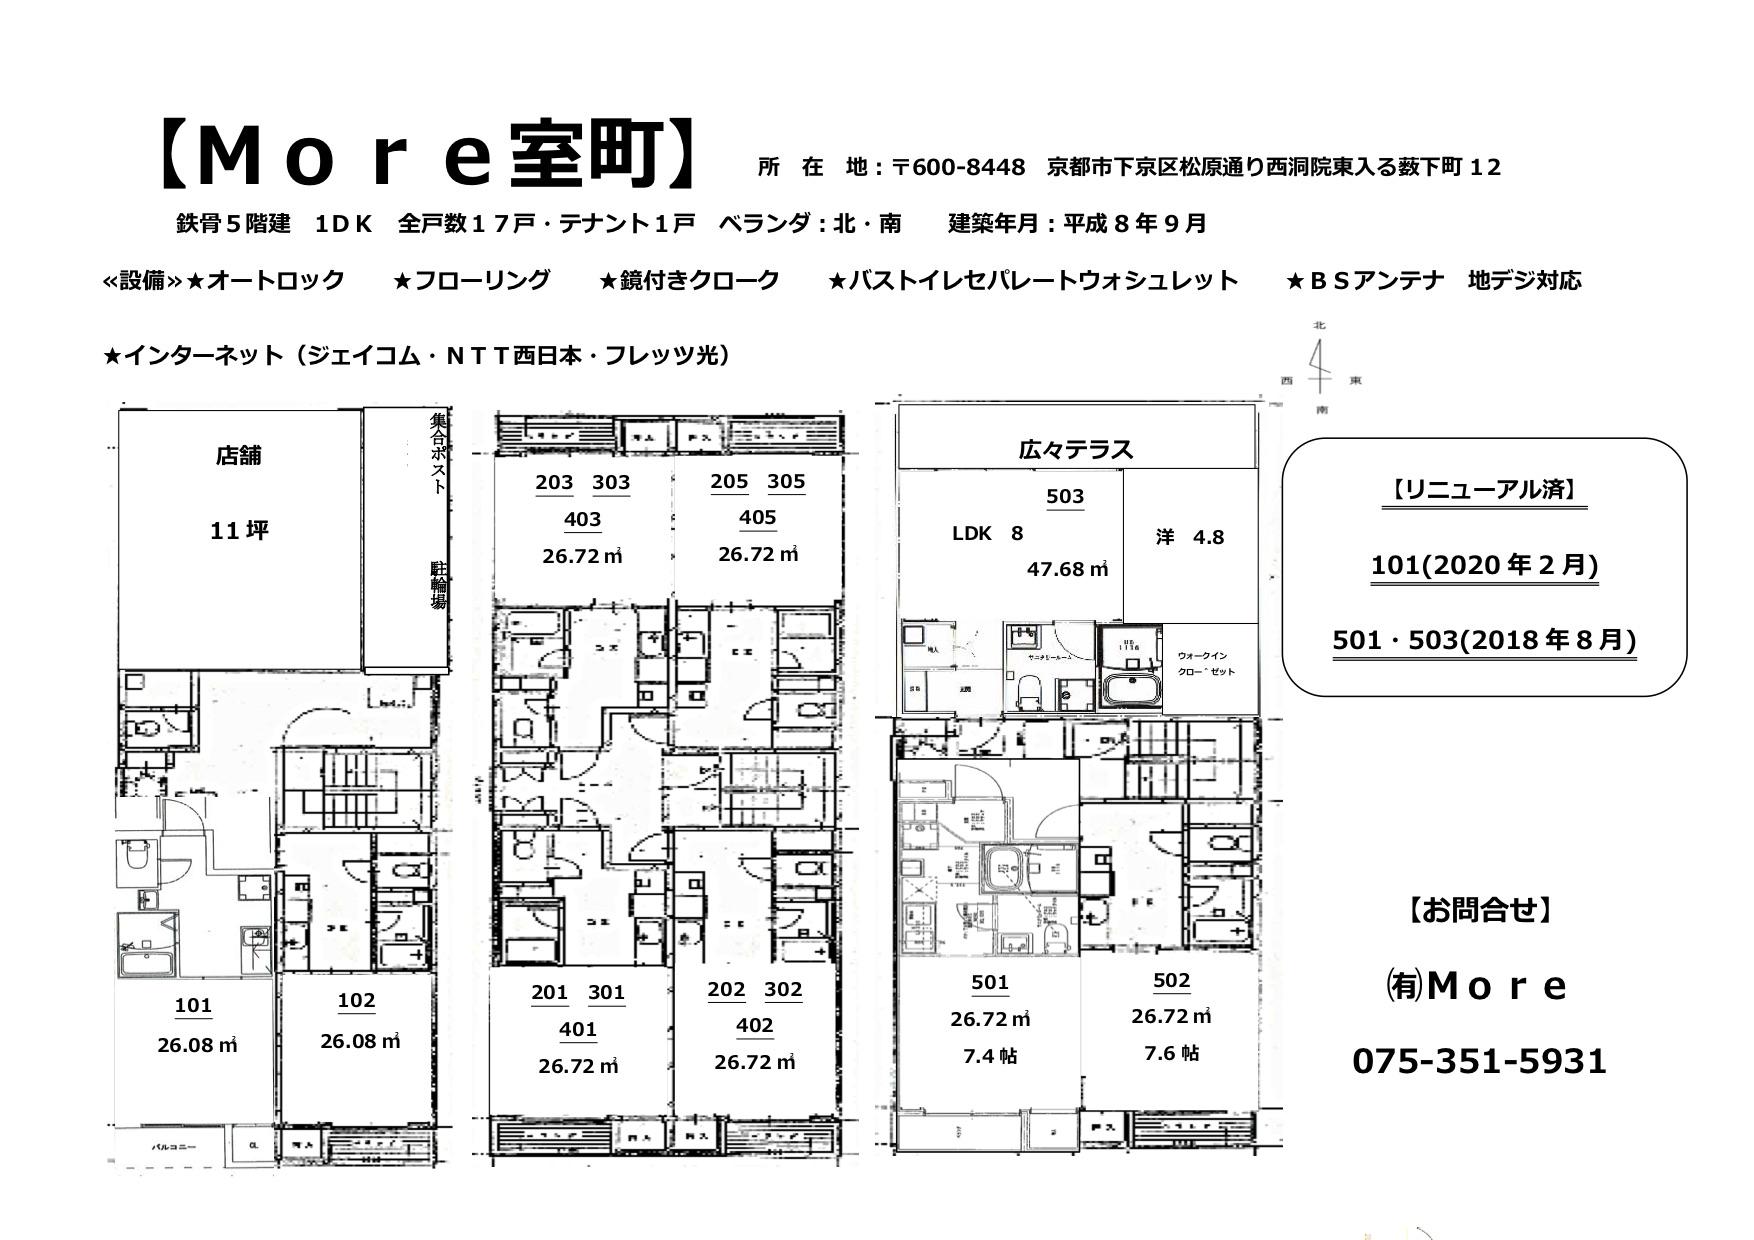 More室町 図面20200203作成